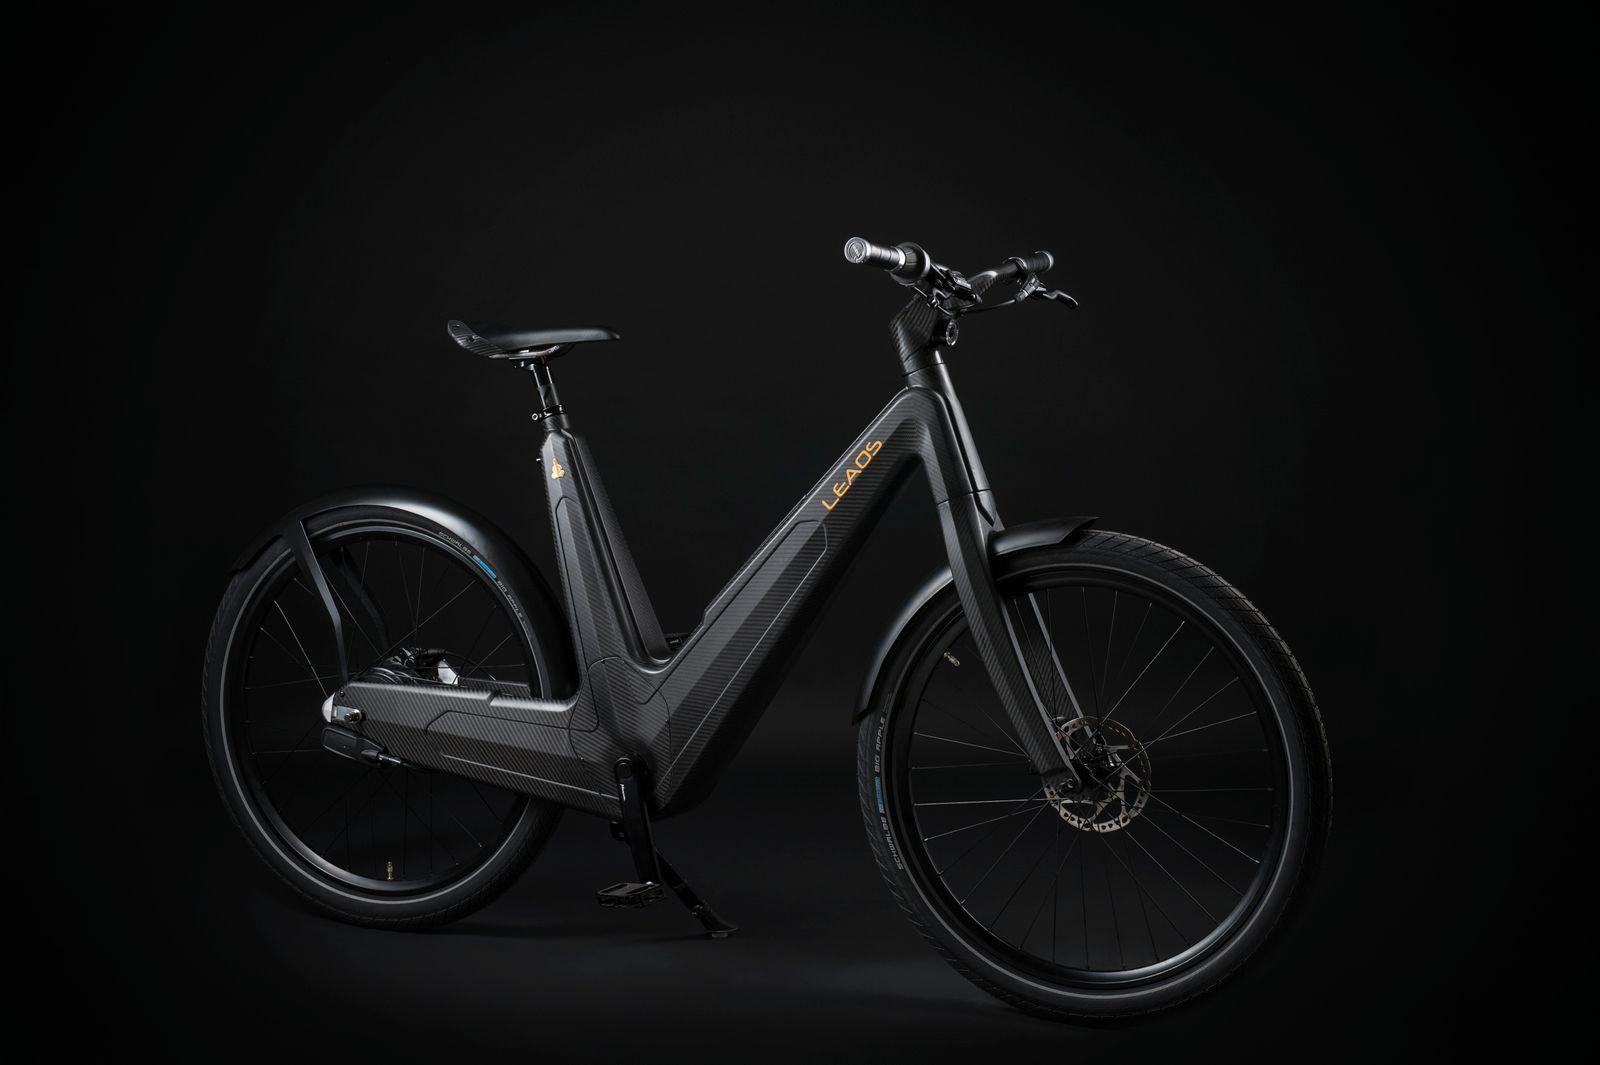 Fahrrad / Leaos